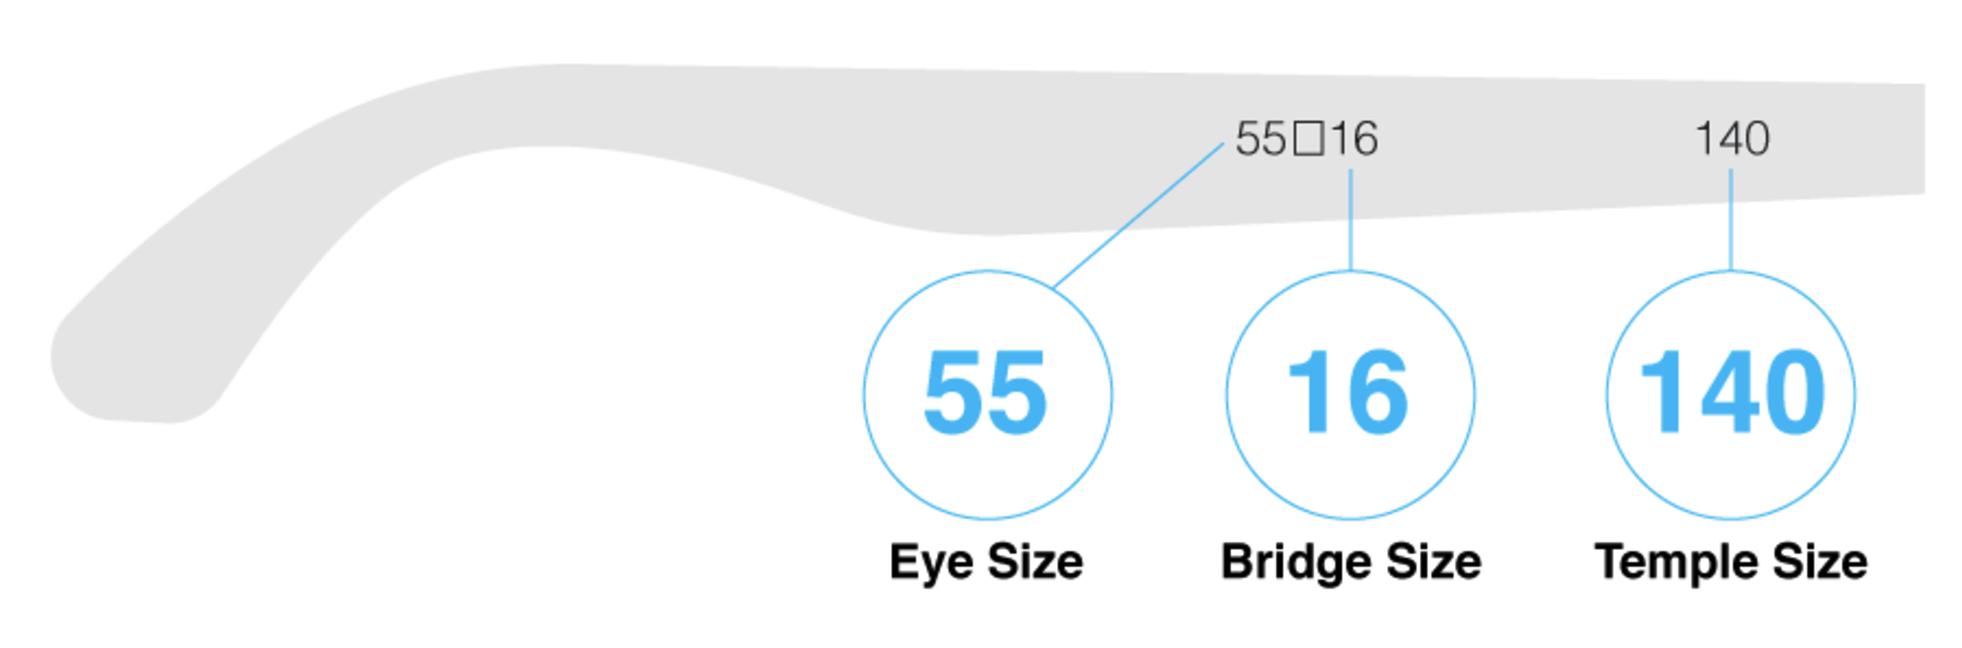 Temple size of sunglasses or glasses (Eye Size, Bridge Size, Temple Size)